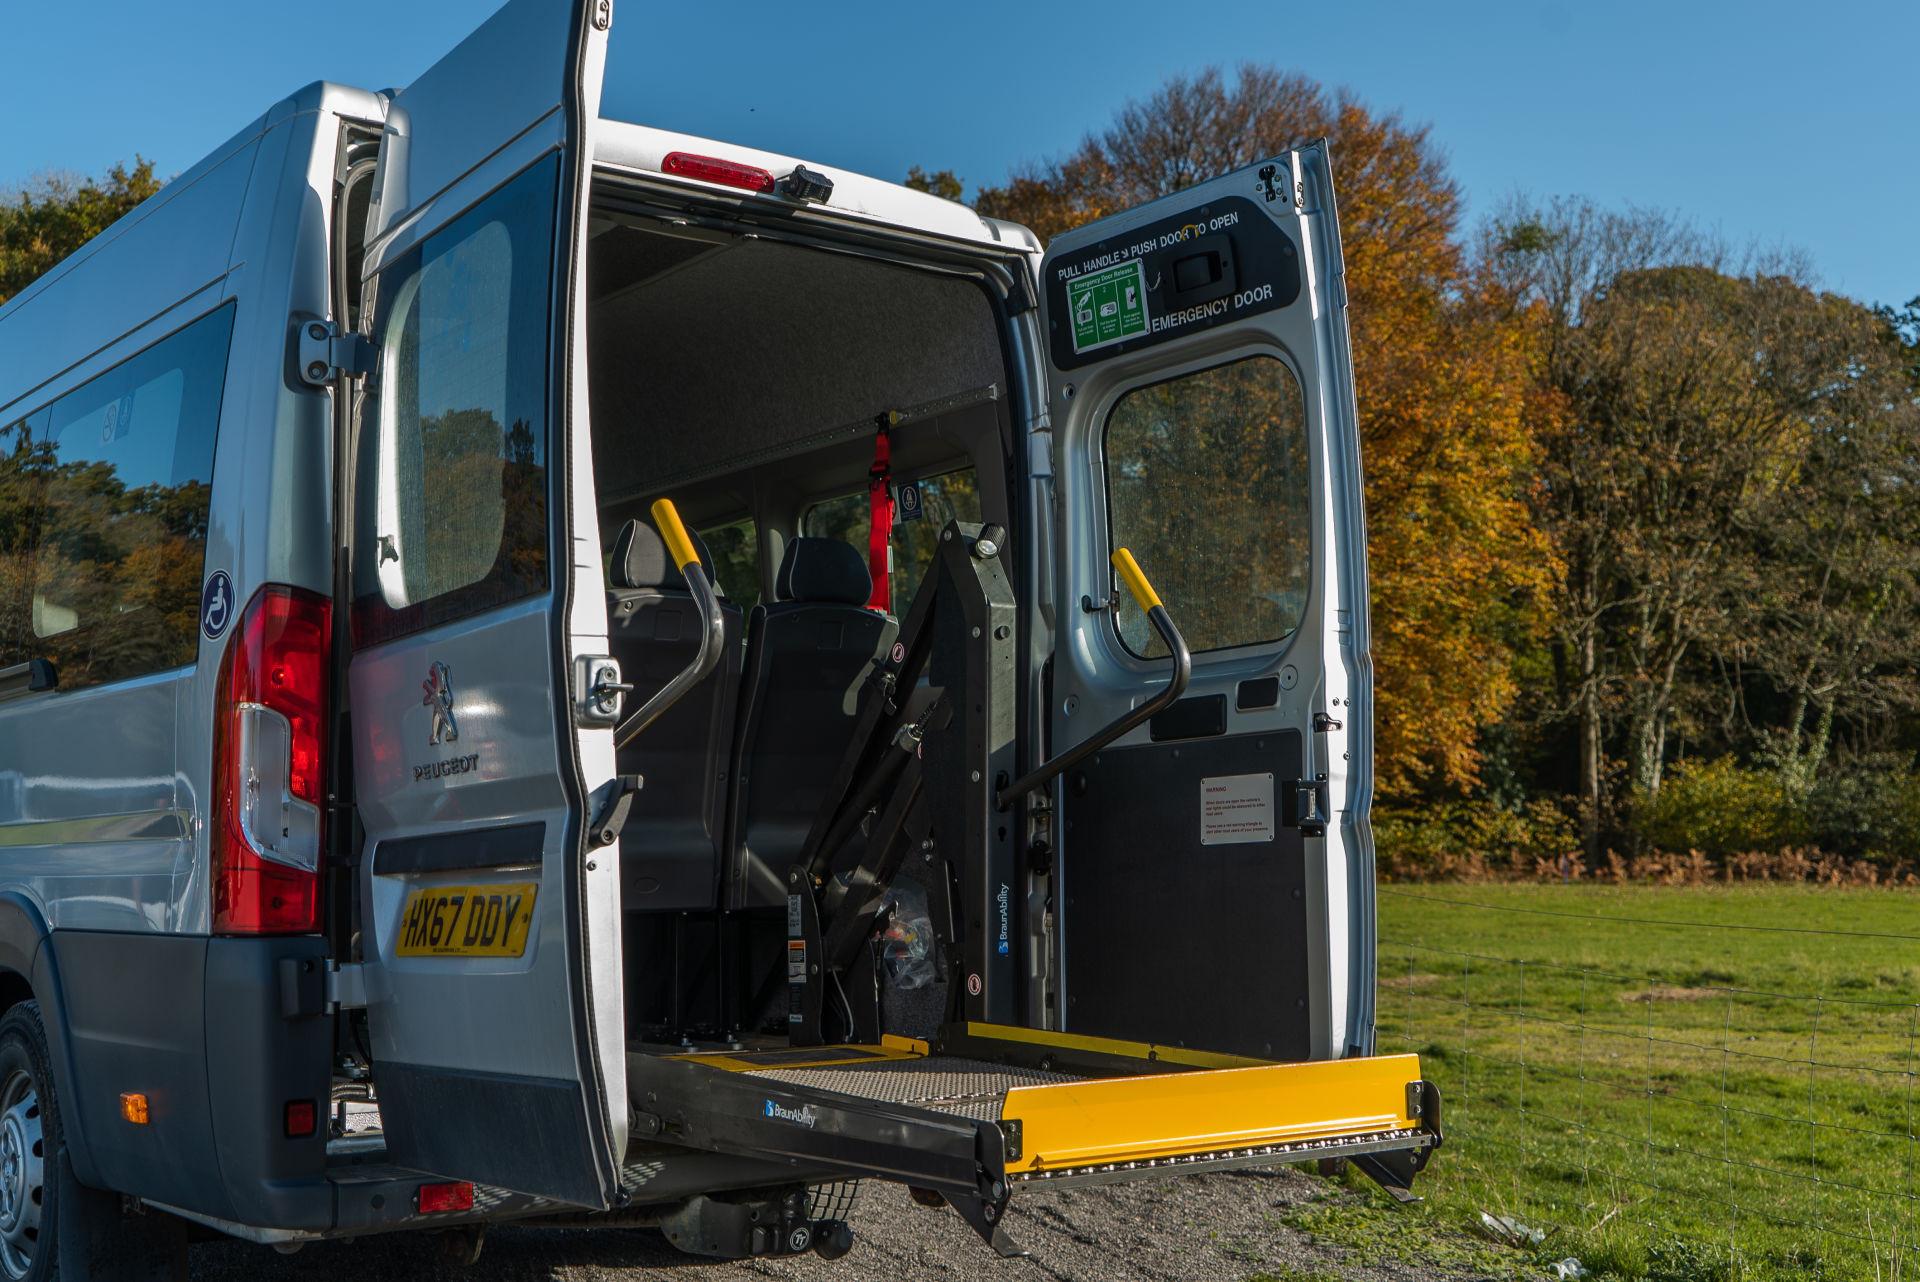 Peugeot Boxer 17 Seater Accessible Minibus for Sale - Image 5